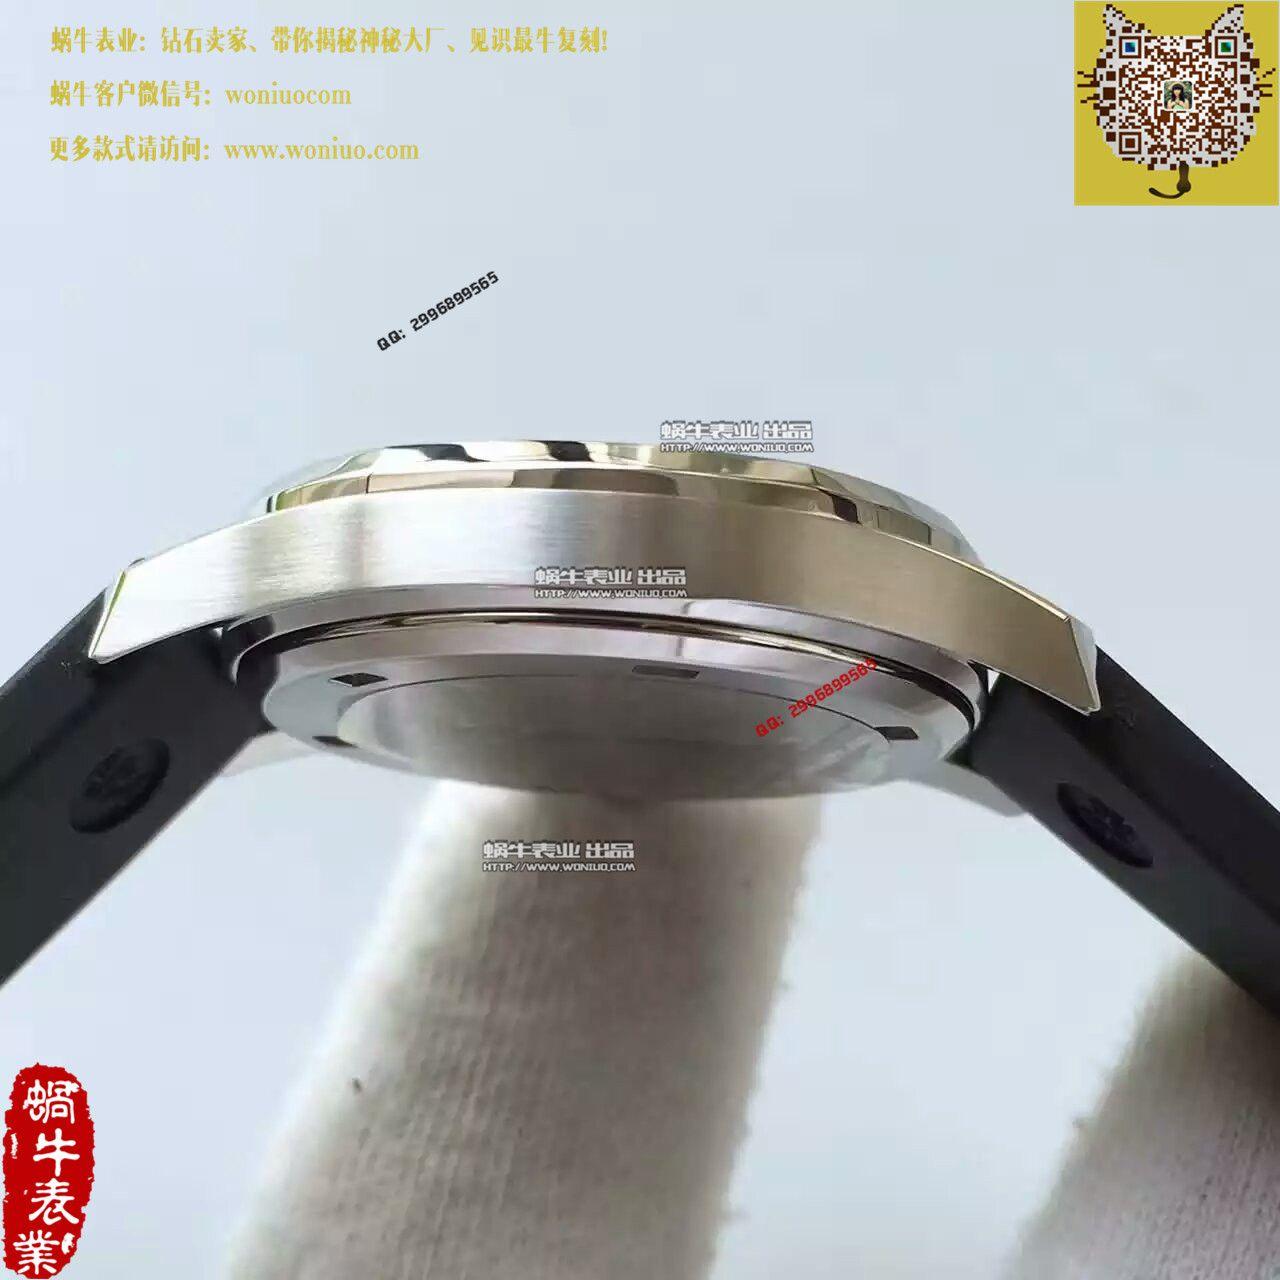 【BP一比一精仿手表】百达翡丽AQUANAUT系列5067A-001 女士腕表 / BD189